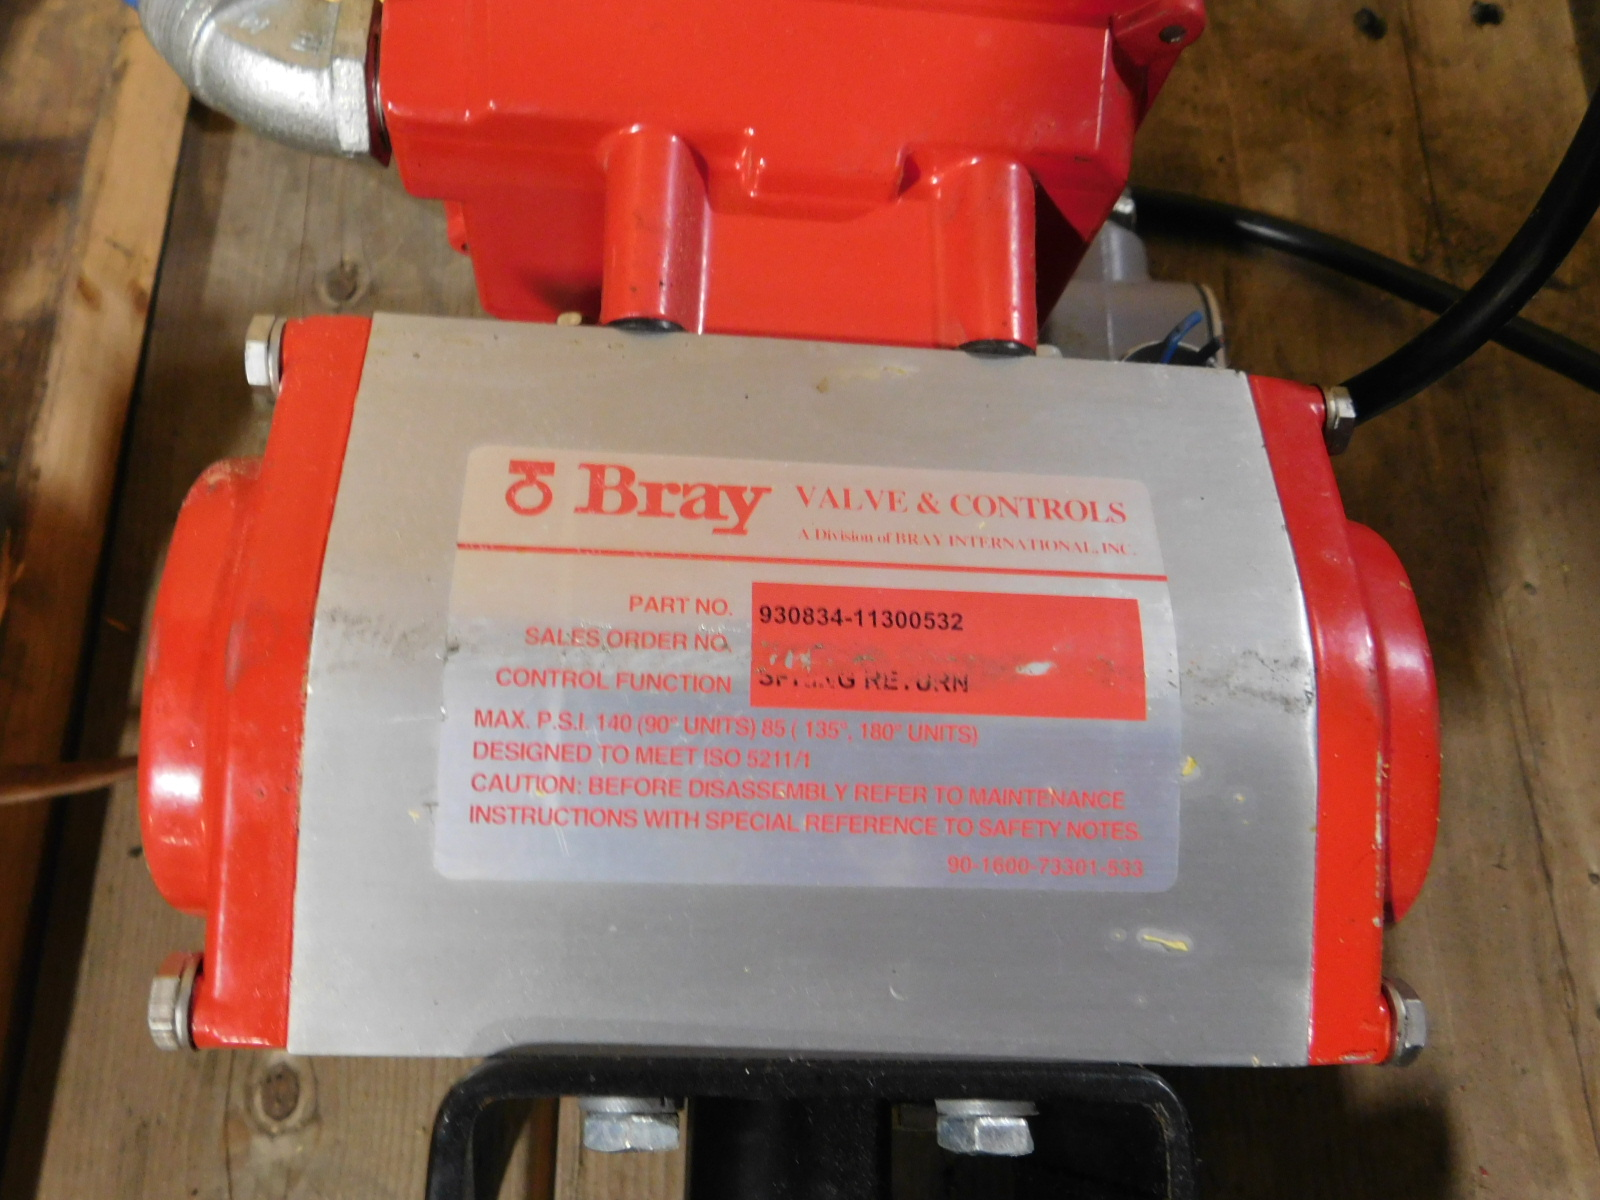 Lot 42 - Bray Vales 50-0406-12610-532,Valve Status Monitor/LMT Switch, SN:930834-11300532 :equipment